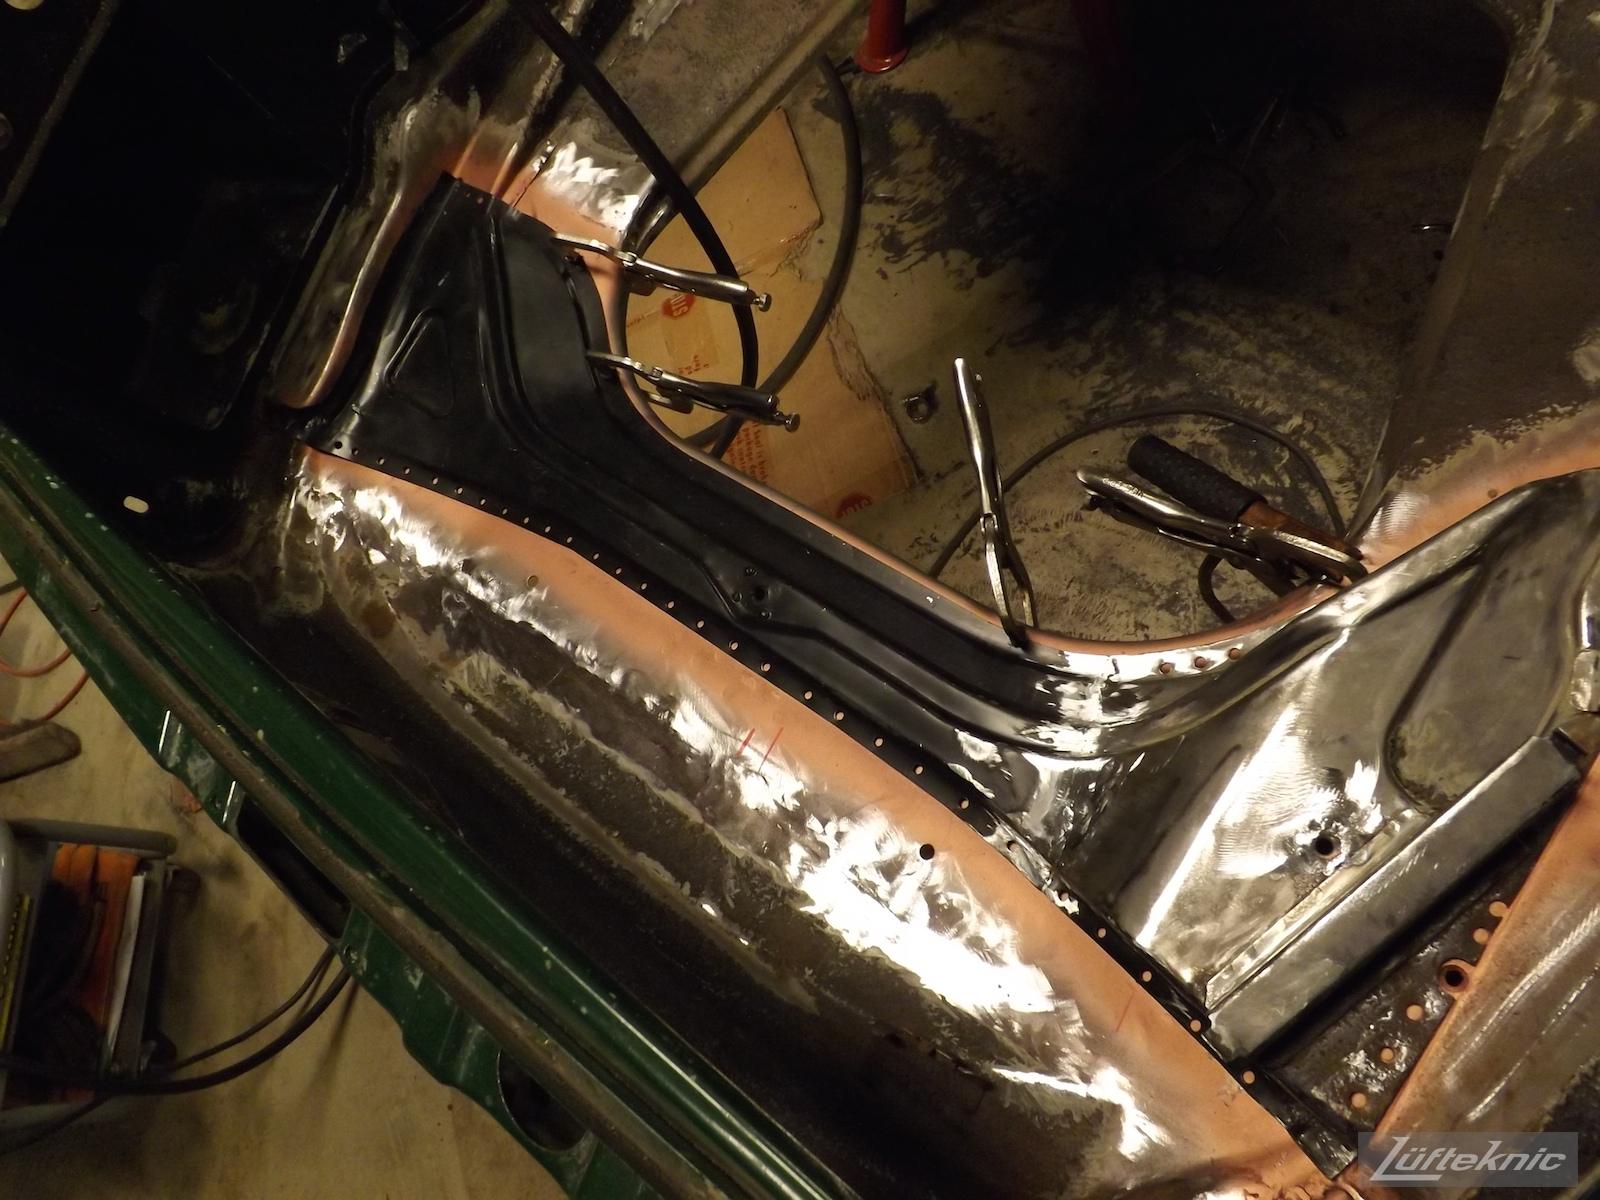 Finishing the layers of metal on an Irish Green Porsche 912 undergoing restoration at Lufteknic.